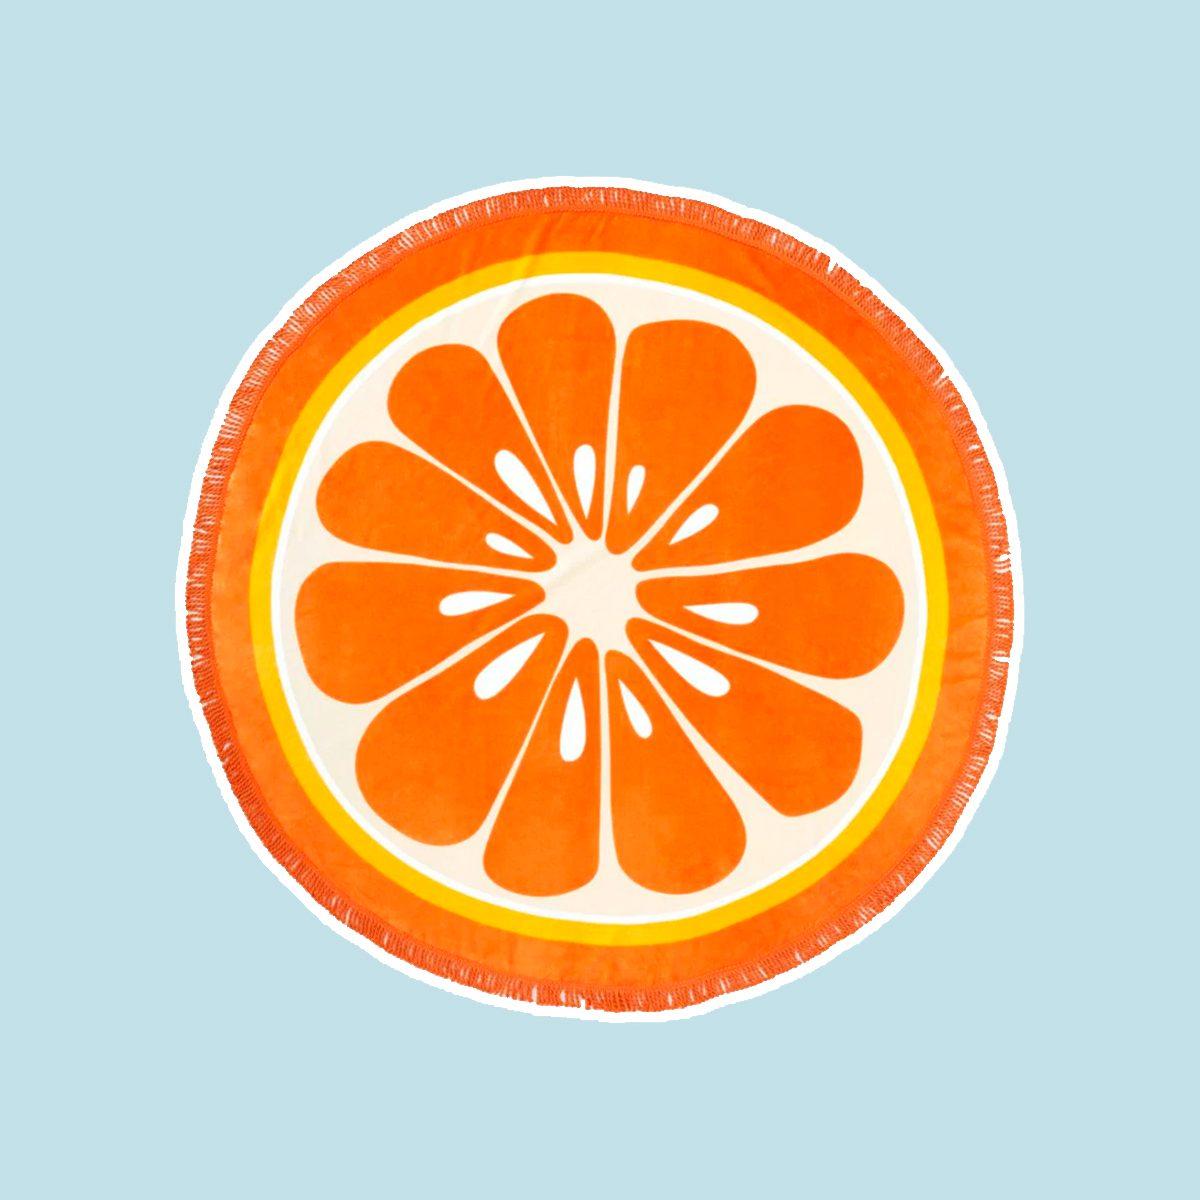 Round Orange Towel